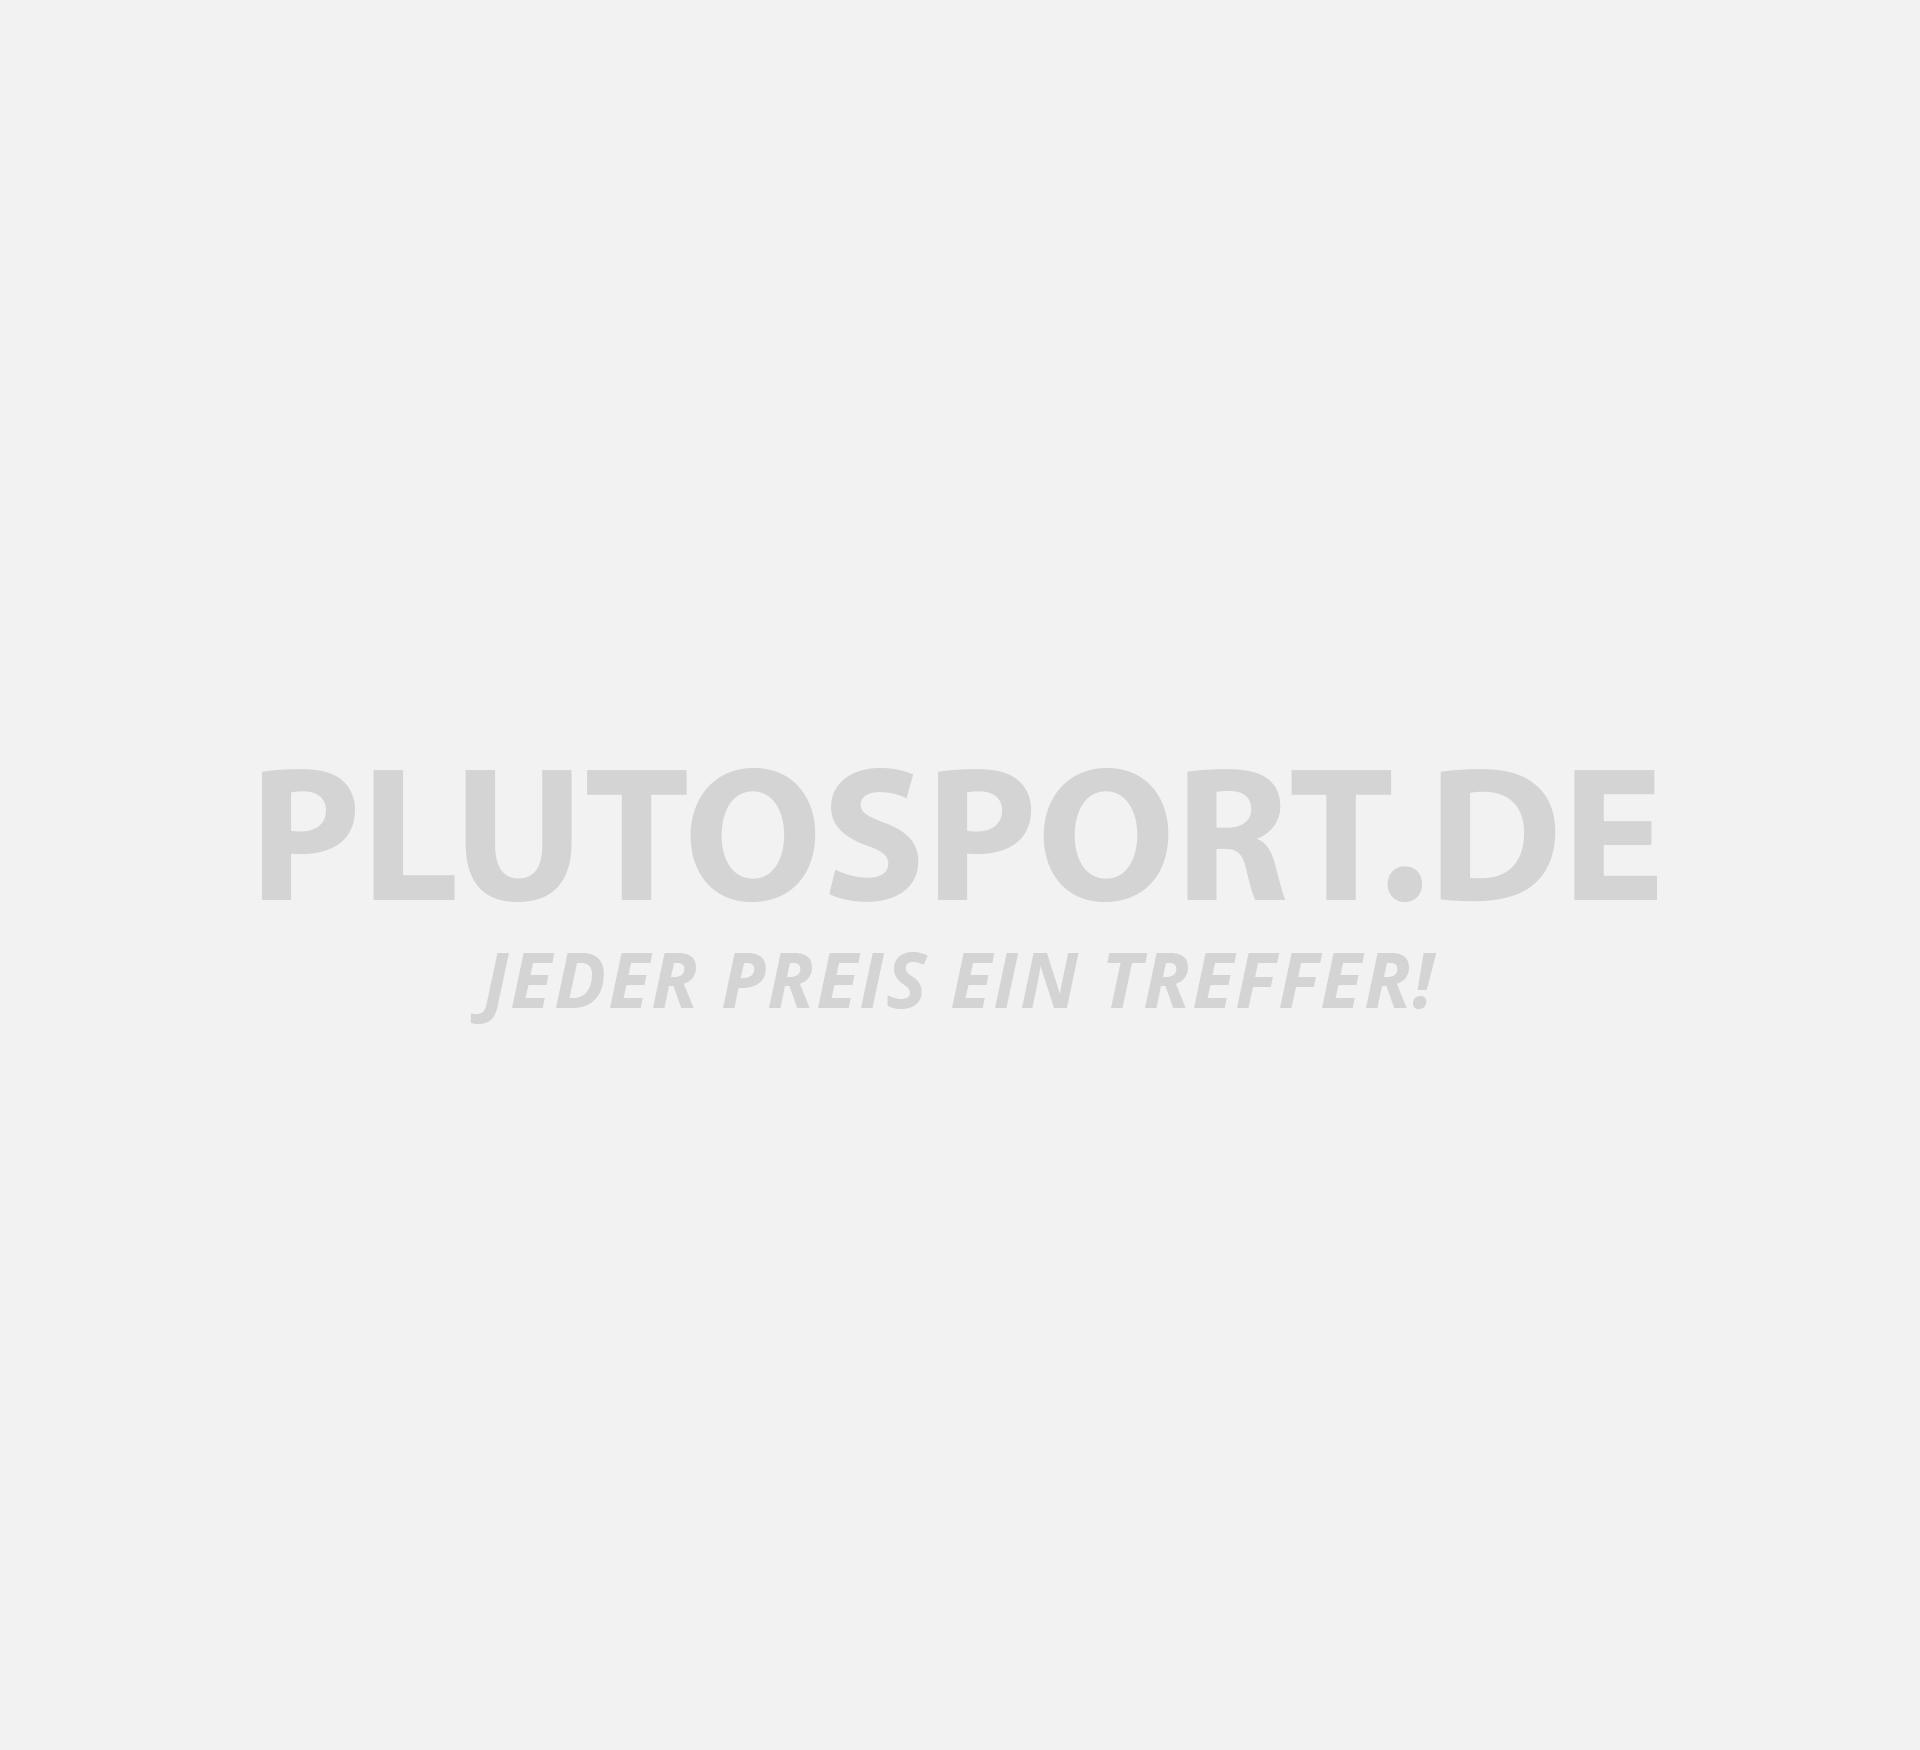 Adidas Uniforia League Sala Fußball EK 2020